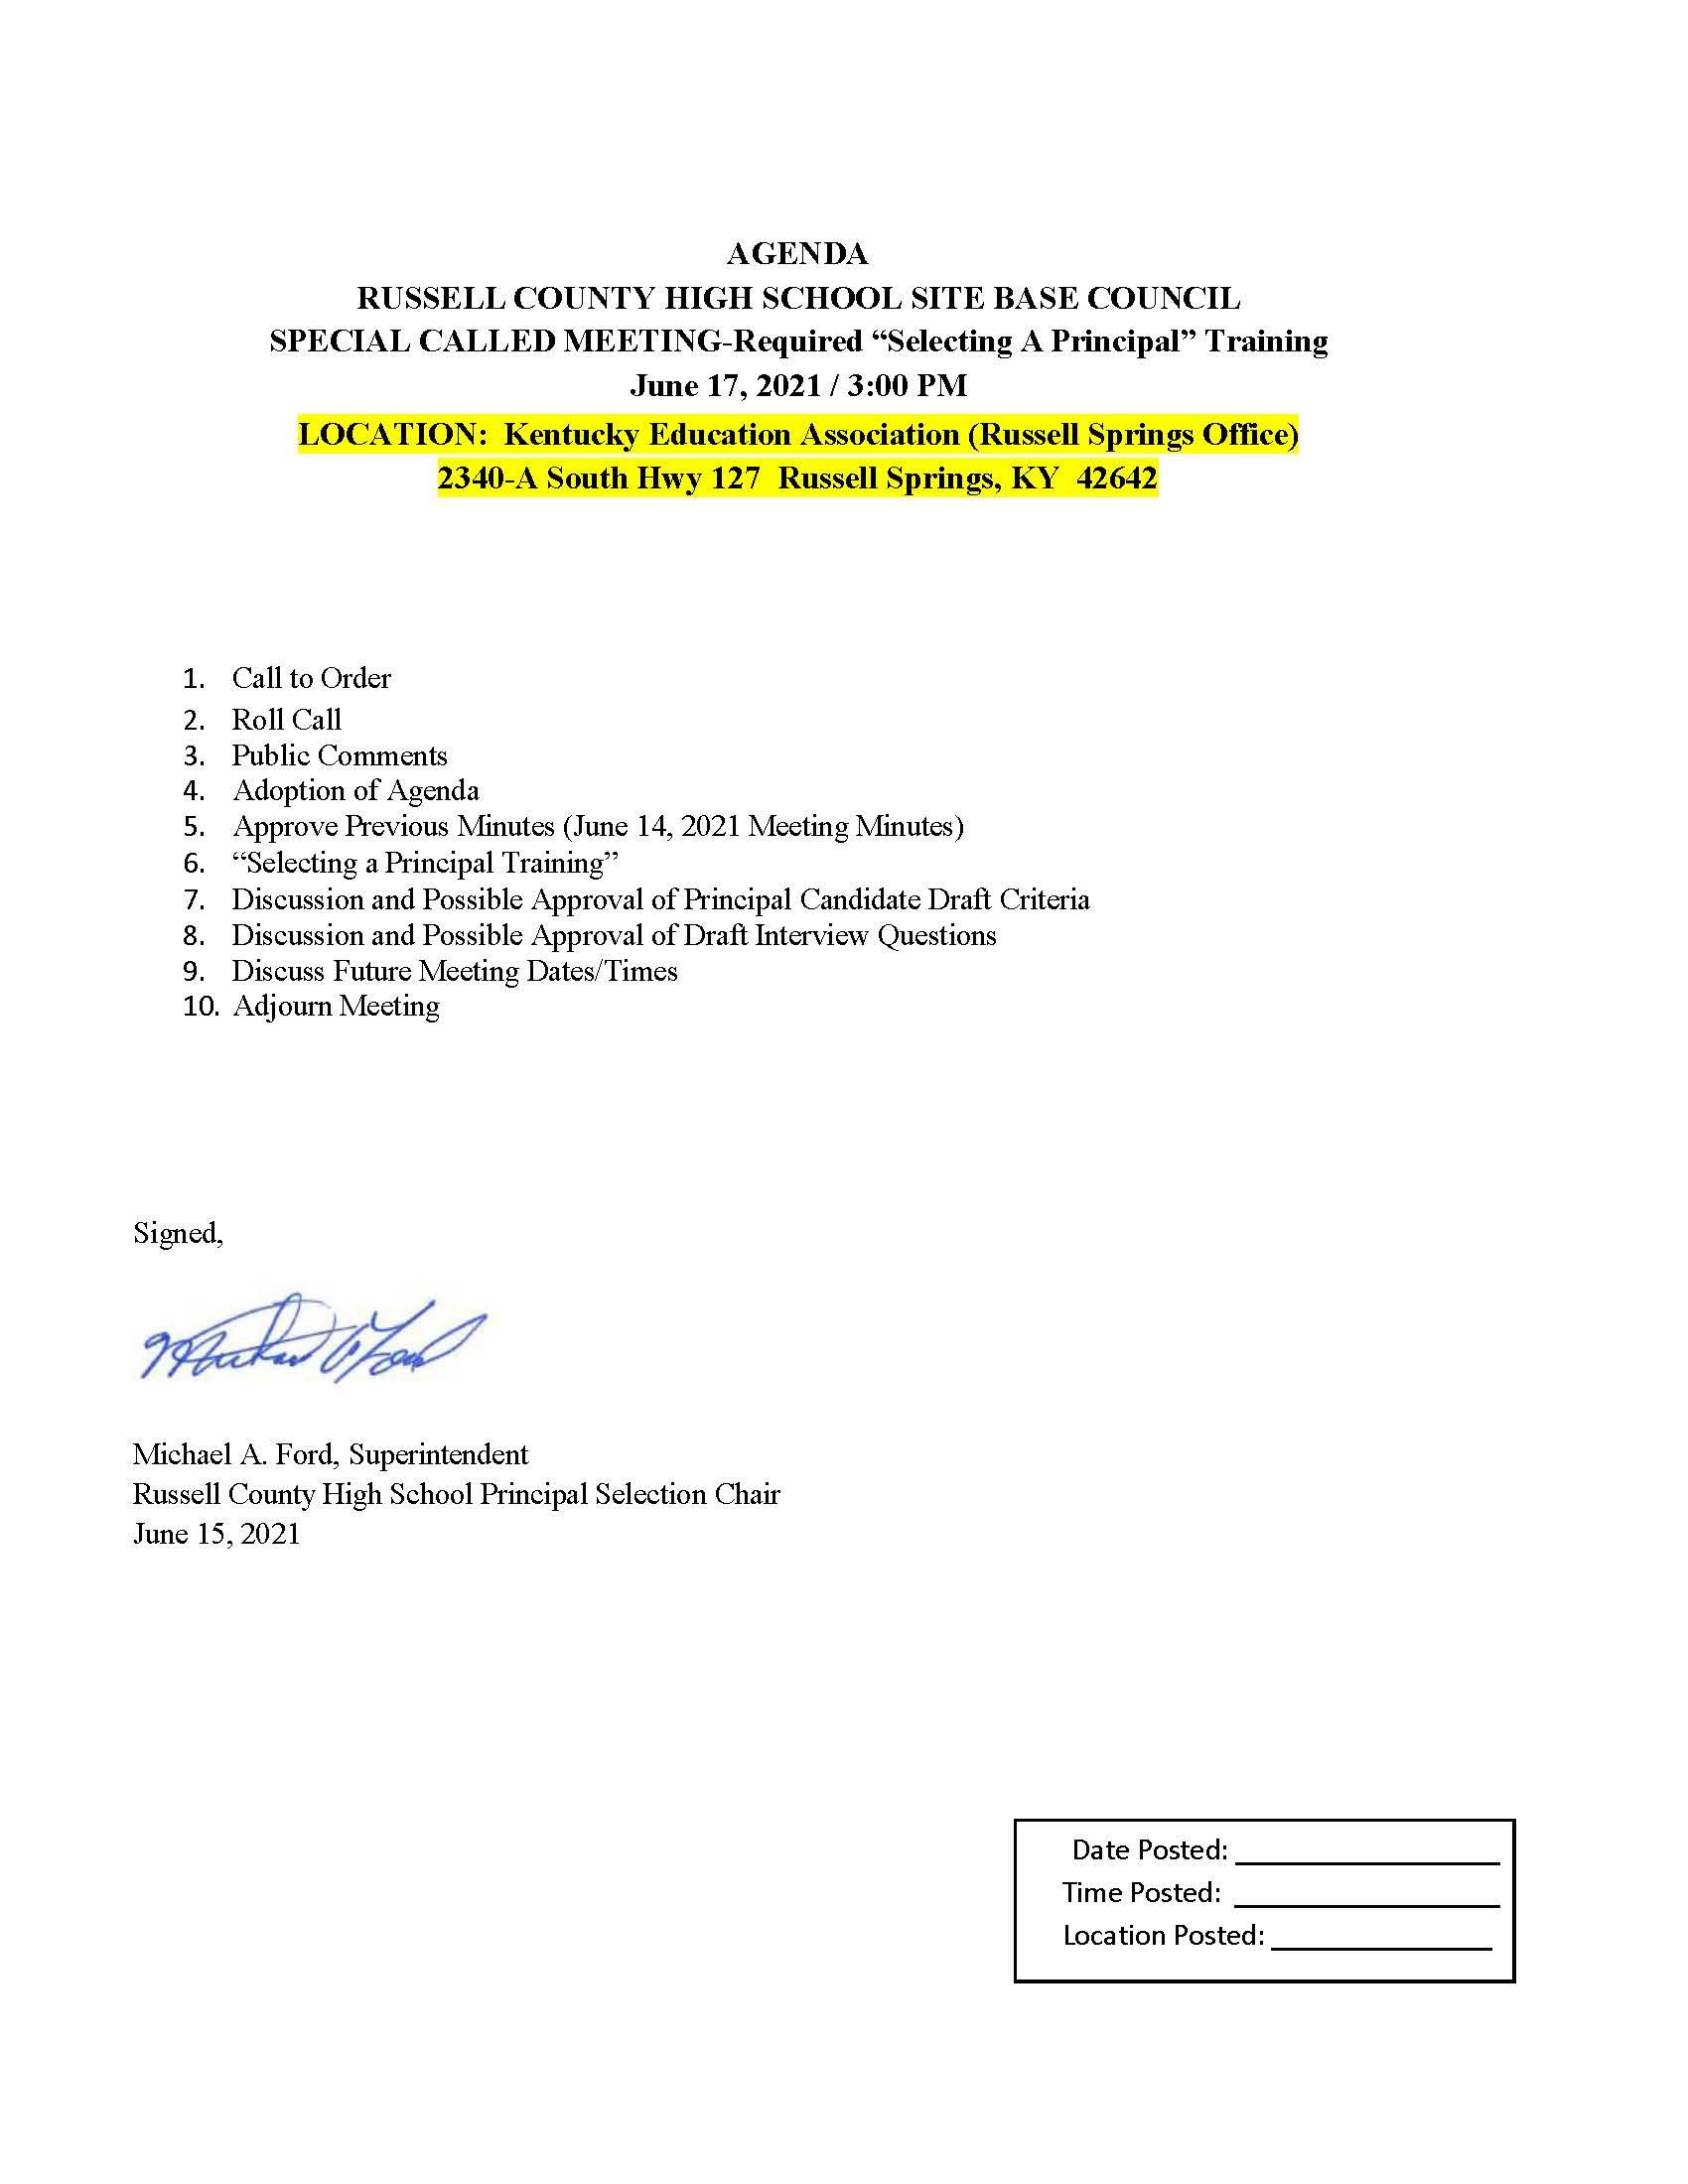 June 17 RCHS SBDM meeting